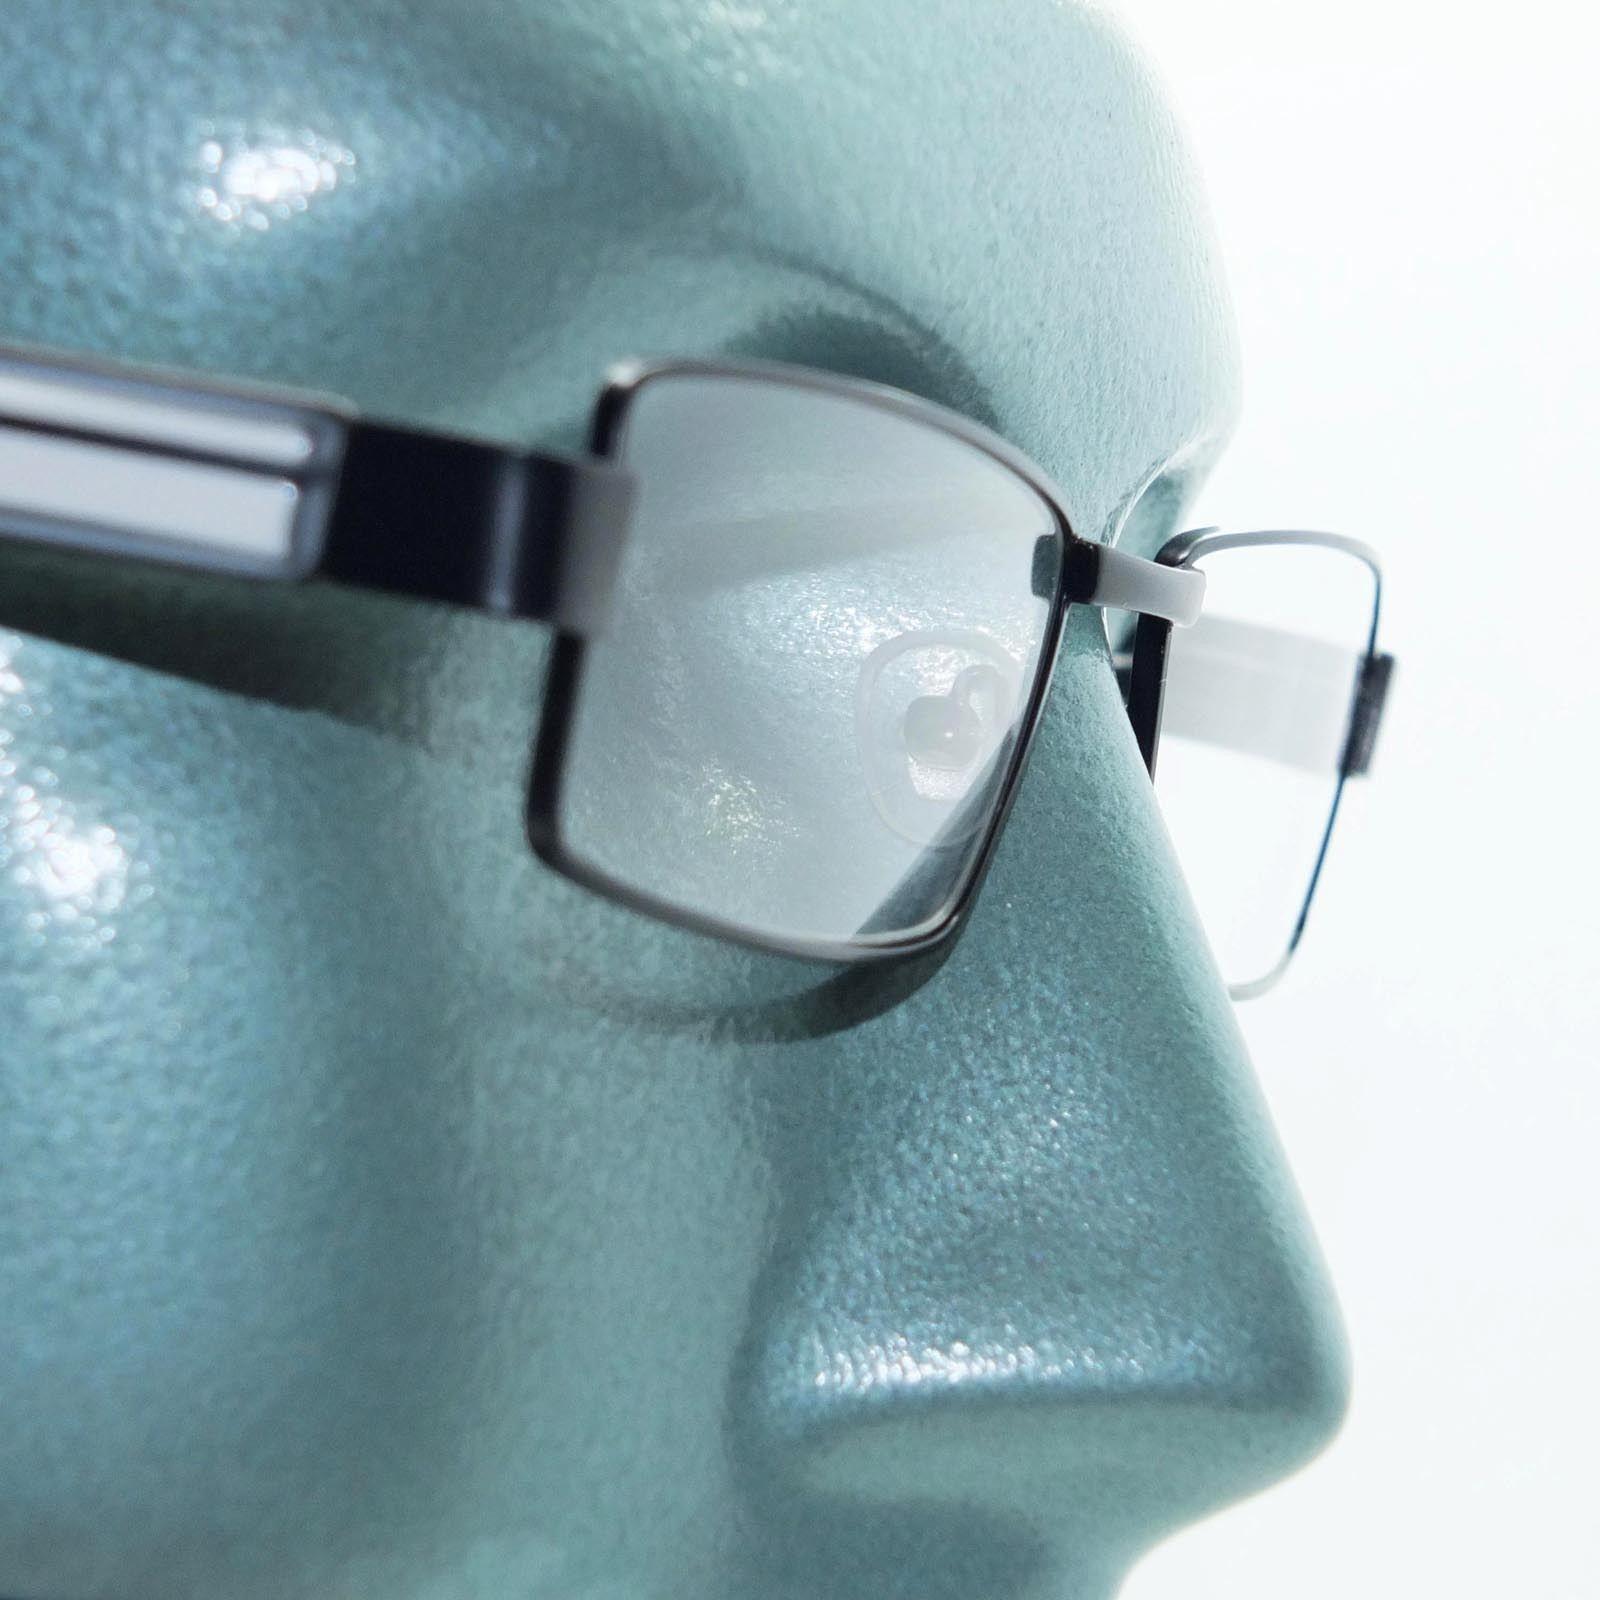 Reading Glasses Super Hi Tech Metro Metal Frame Jazz Black White Detail +1.50 - $23.00